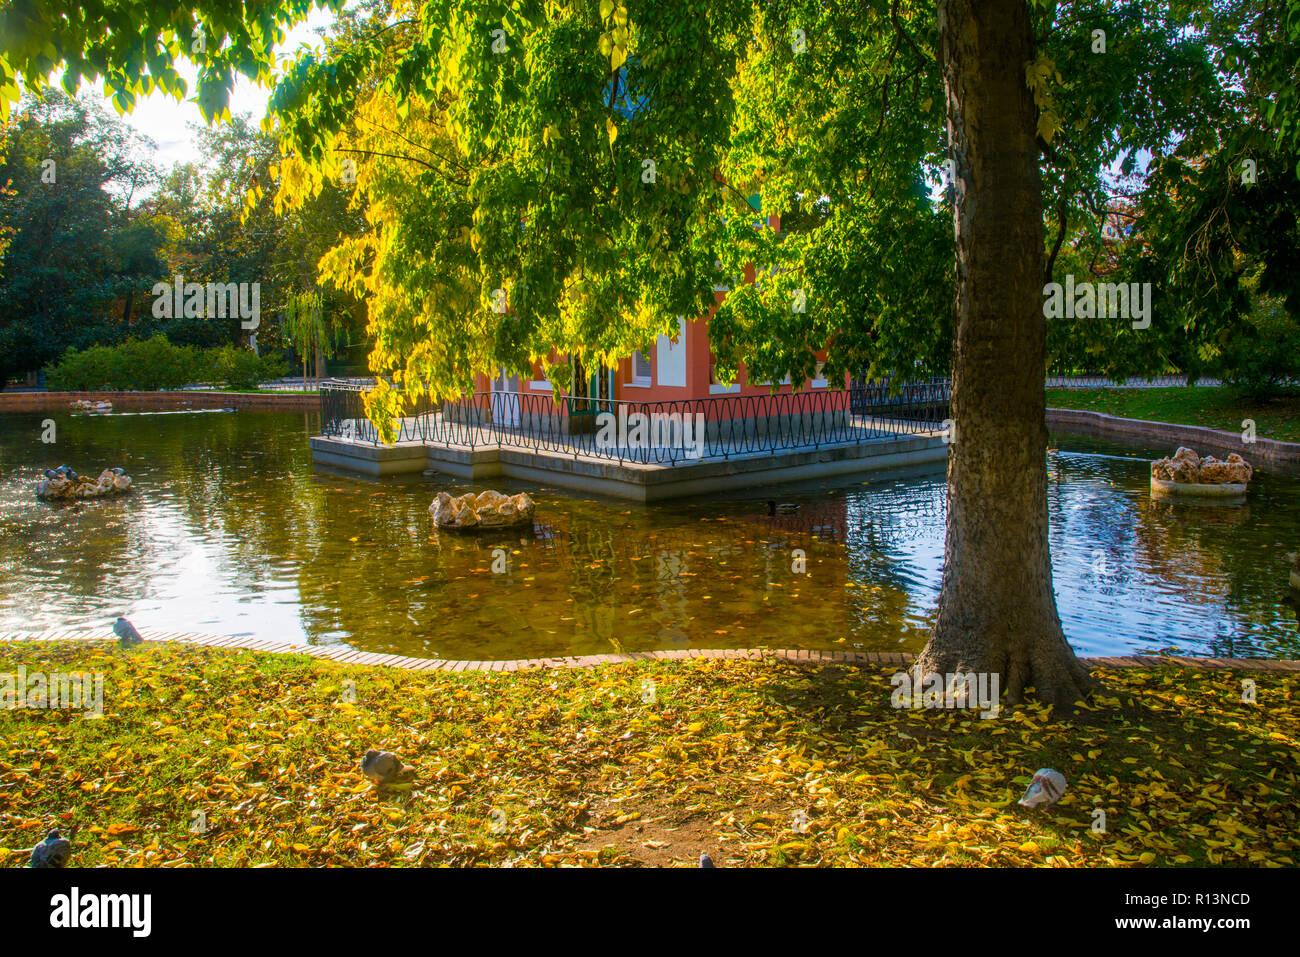 Casita del Pescador and its pond. The Retiro park, Madrid, Spain. - Stock Image